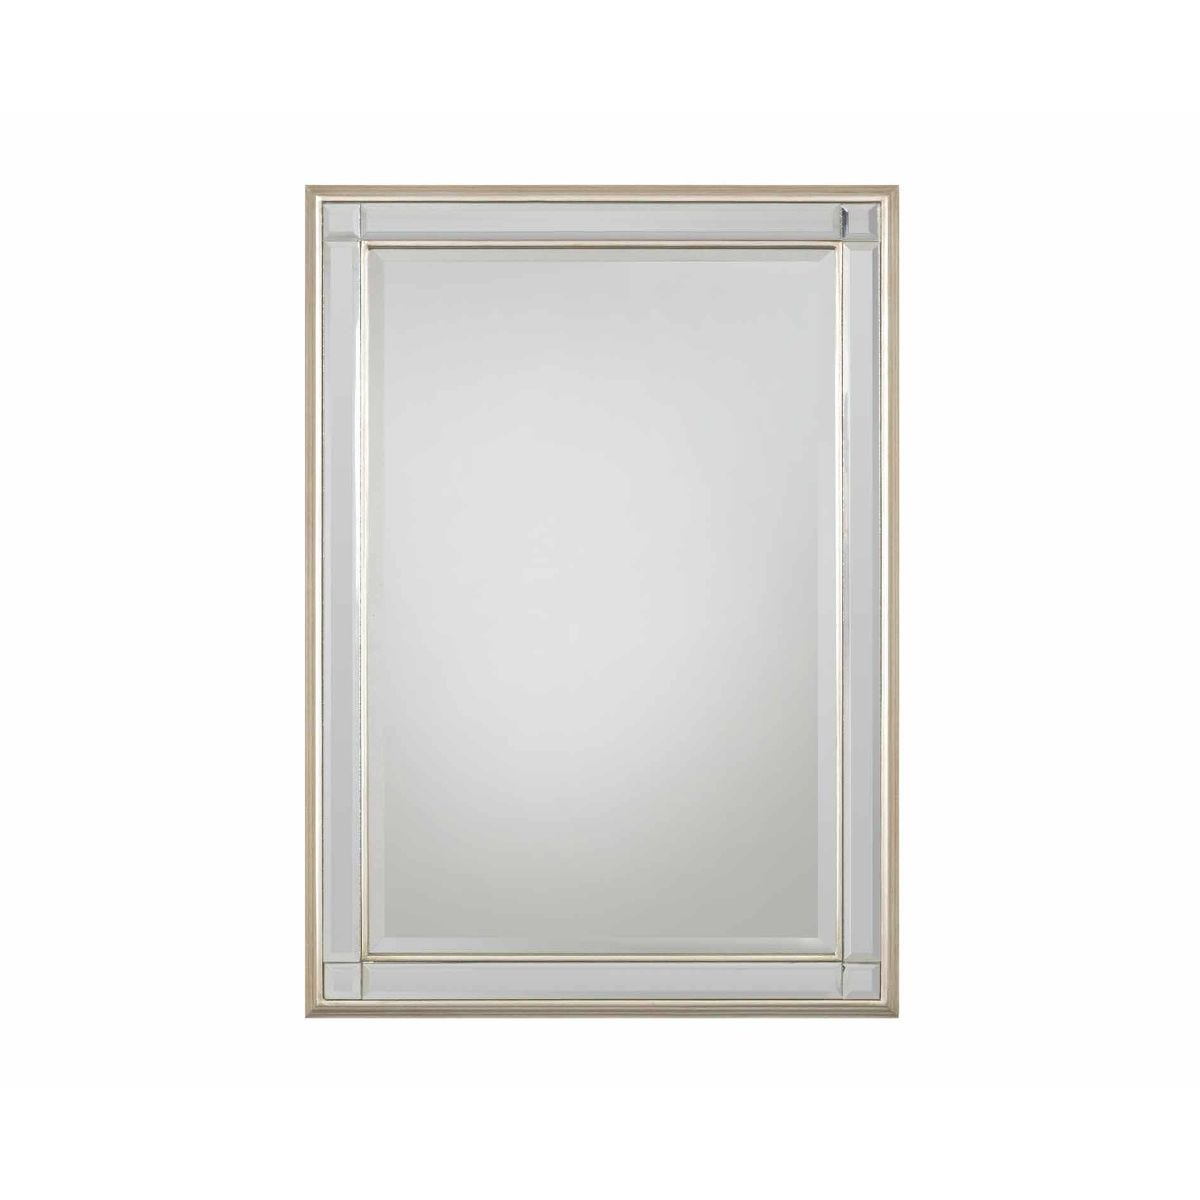 Chelsea Bevelled Rectangular Mirror, Champagne